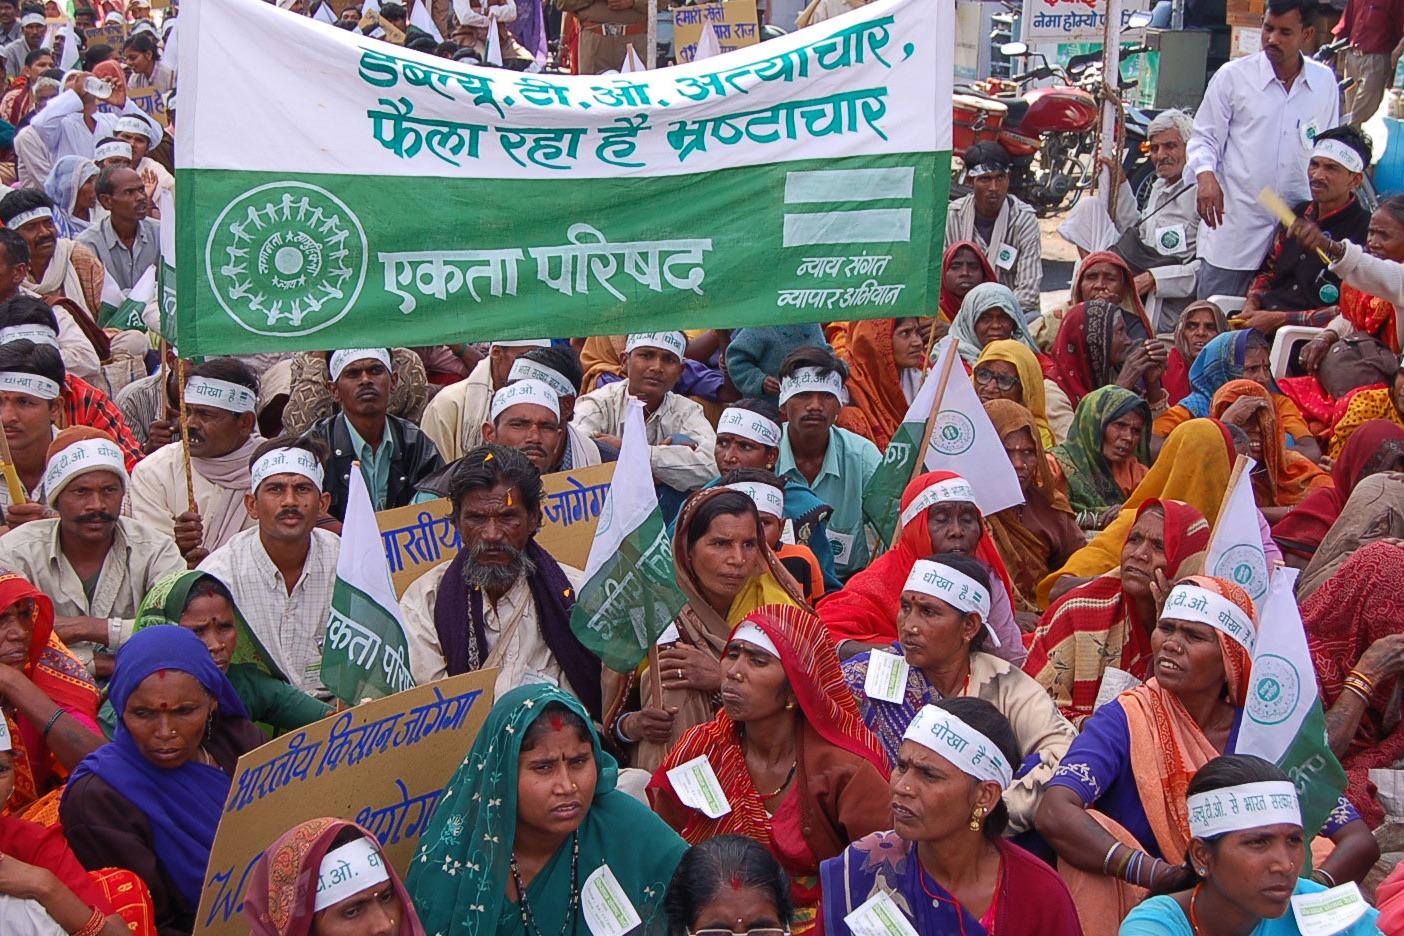 AIIEA solidarity to farmers pesant movement